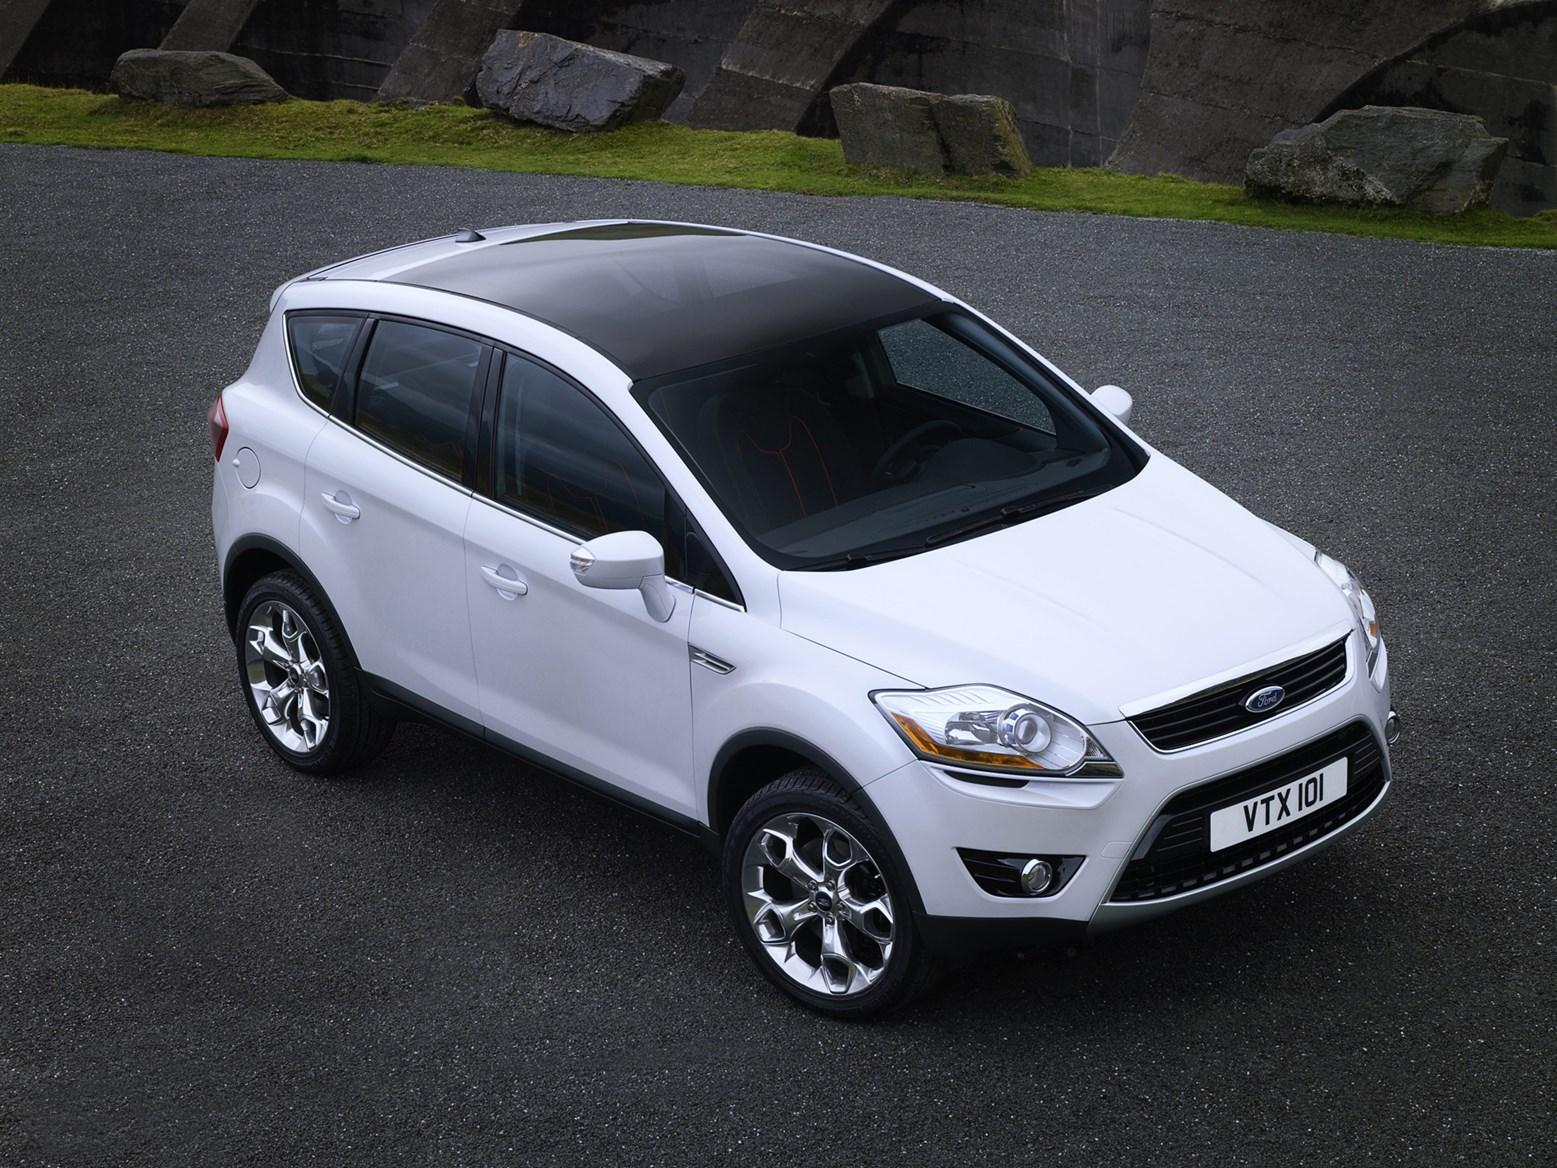 Image Result For Ford Kuga Vs Honda Crv